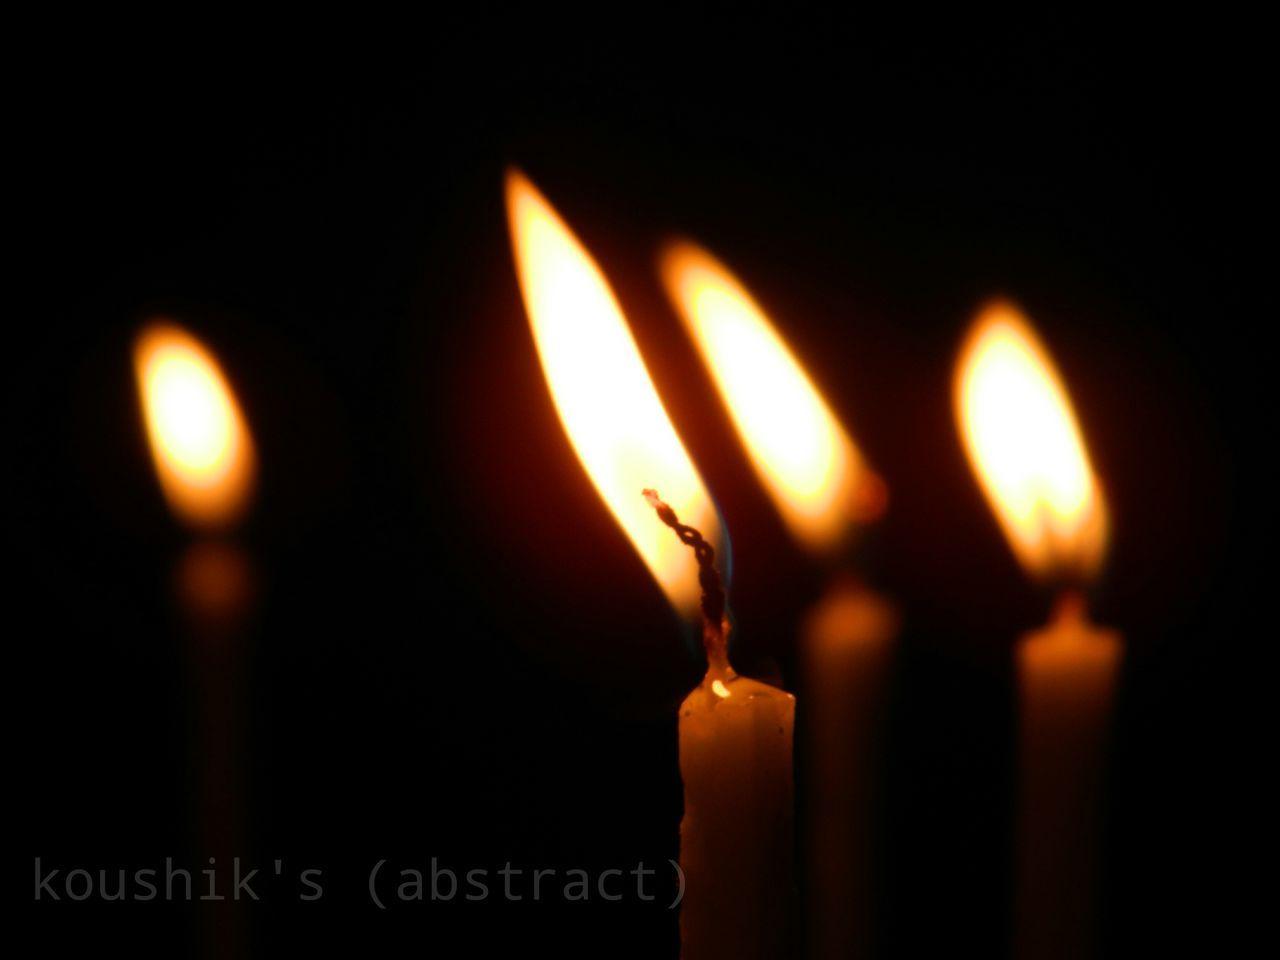 flame, burning, heat - temperature, fire - natural phenomenon, candle, glowing, illuminated, close-up, indoors, no people, darkroom, celebration, night, diya - oil lamp, black background